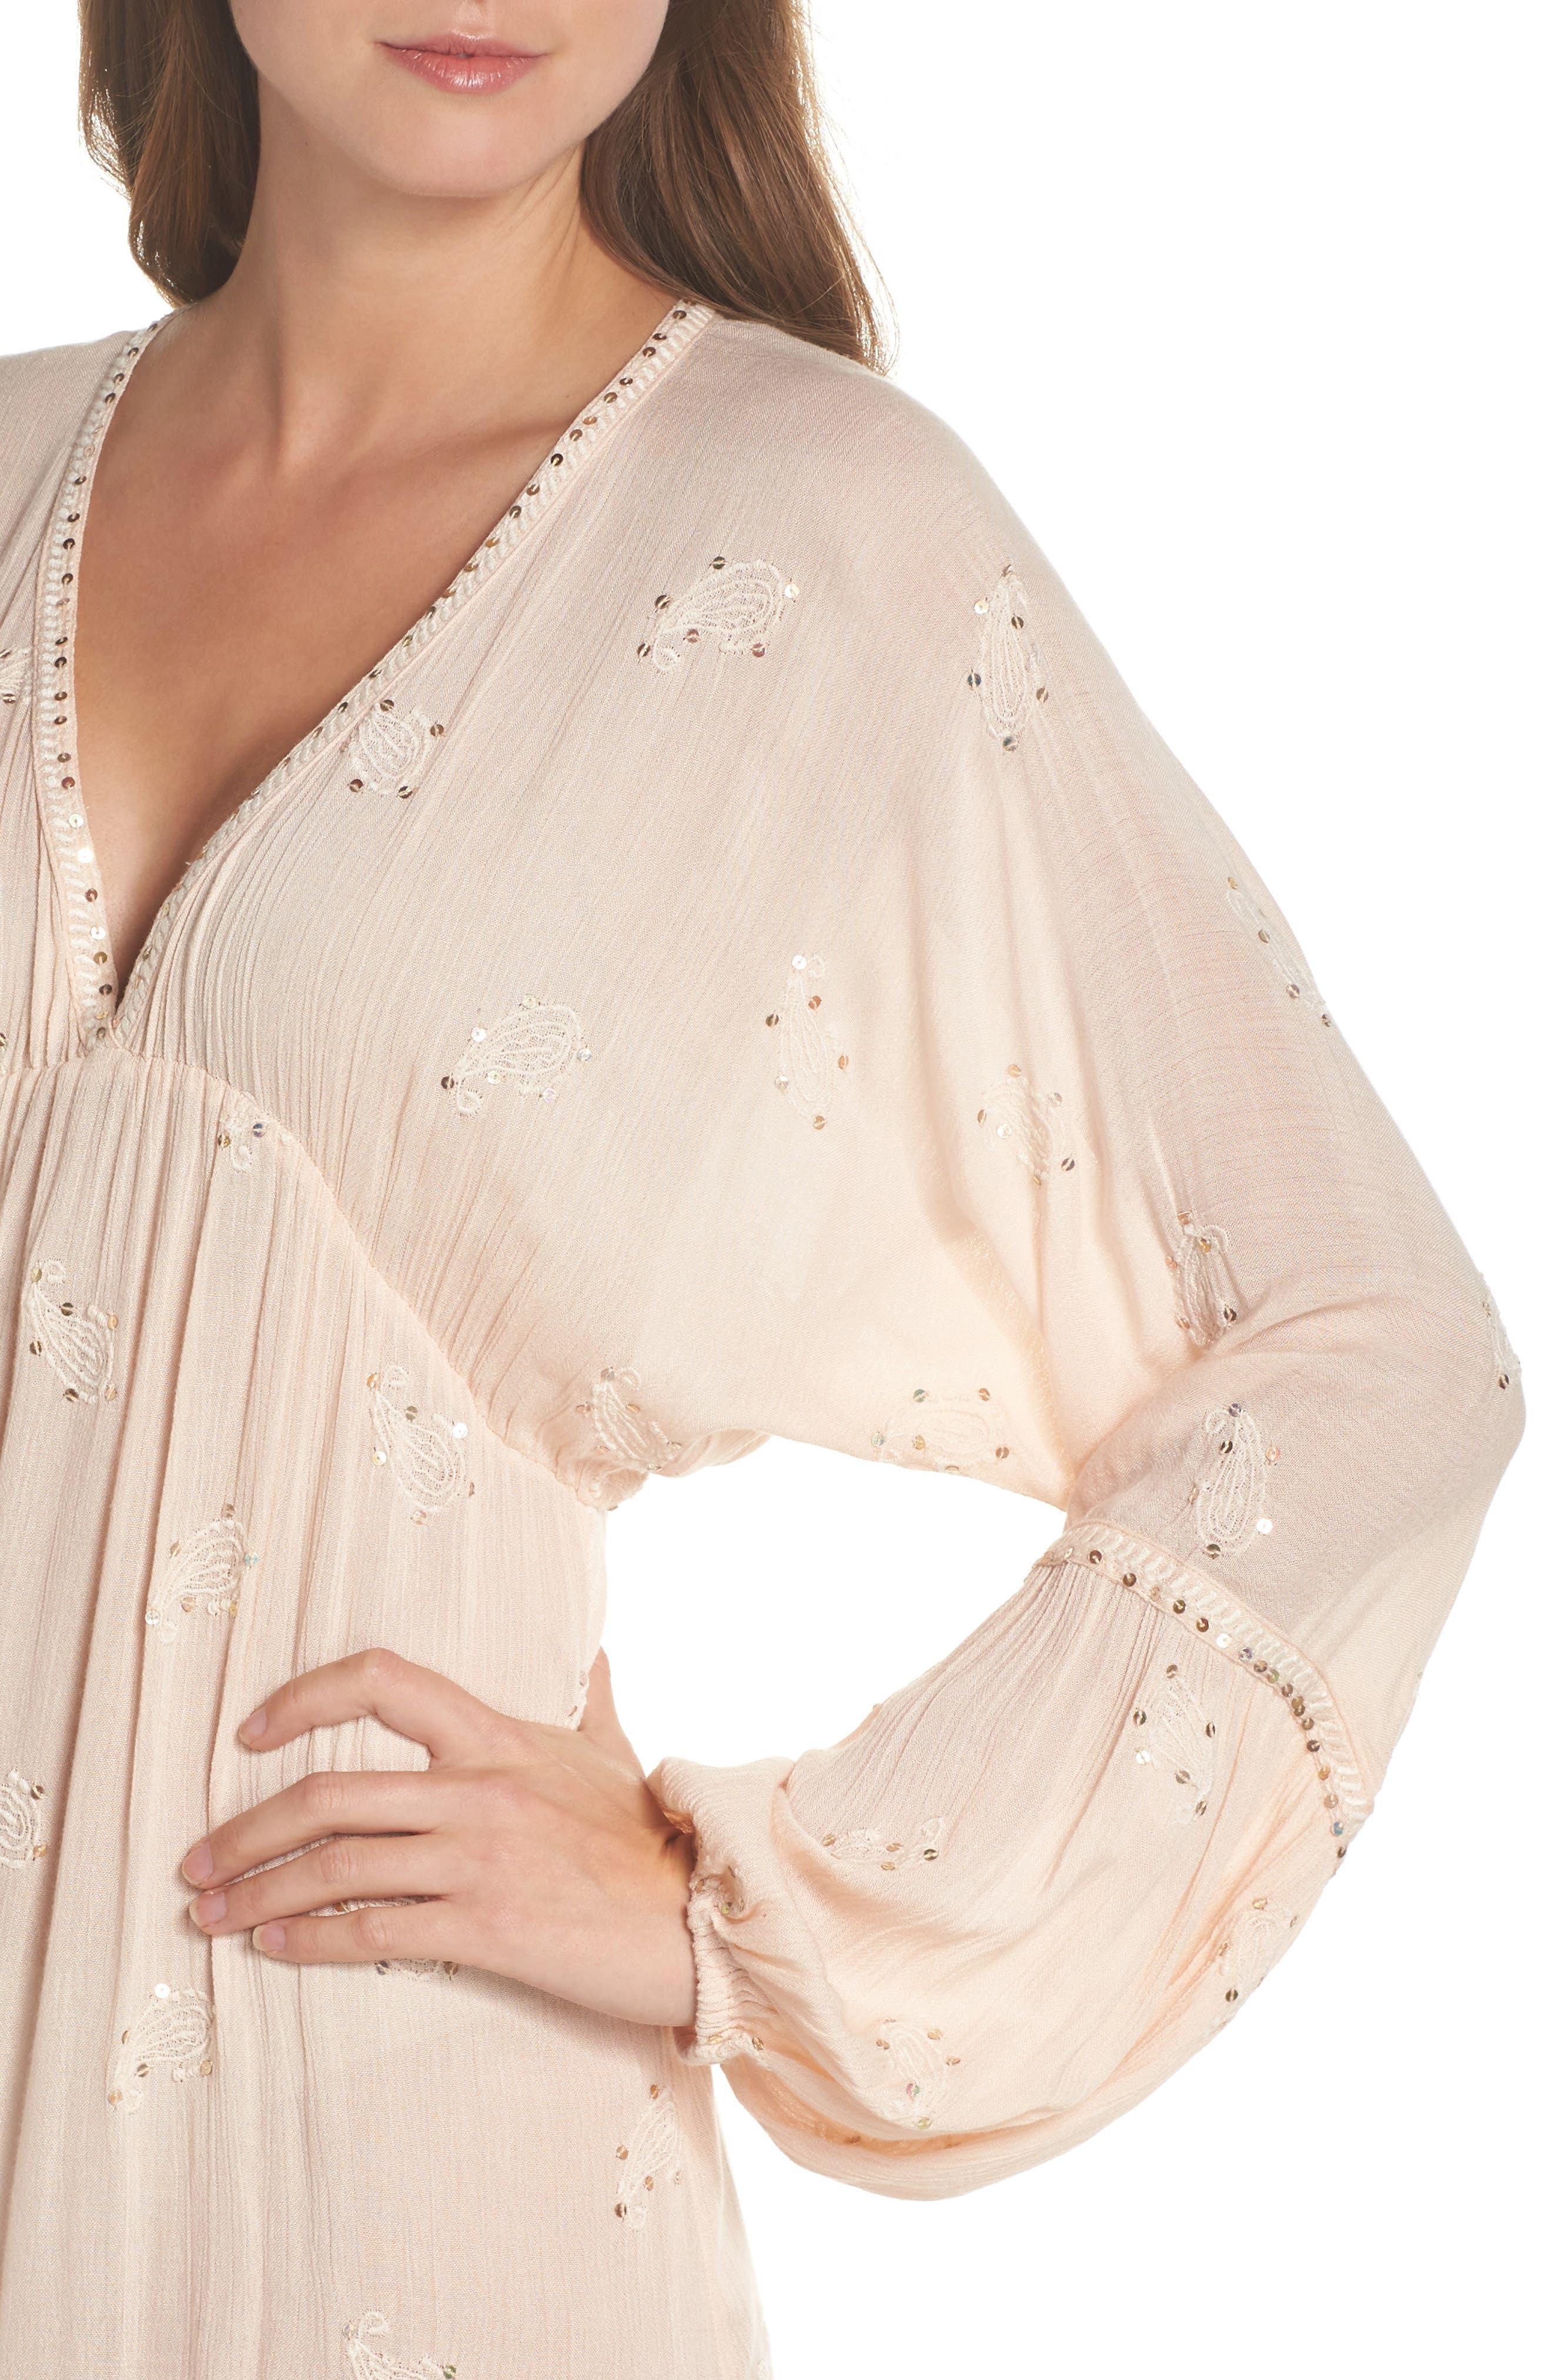 Mercer Cover-Up Maxi Dress,                             Alternate thumbnail 4, color,                             650